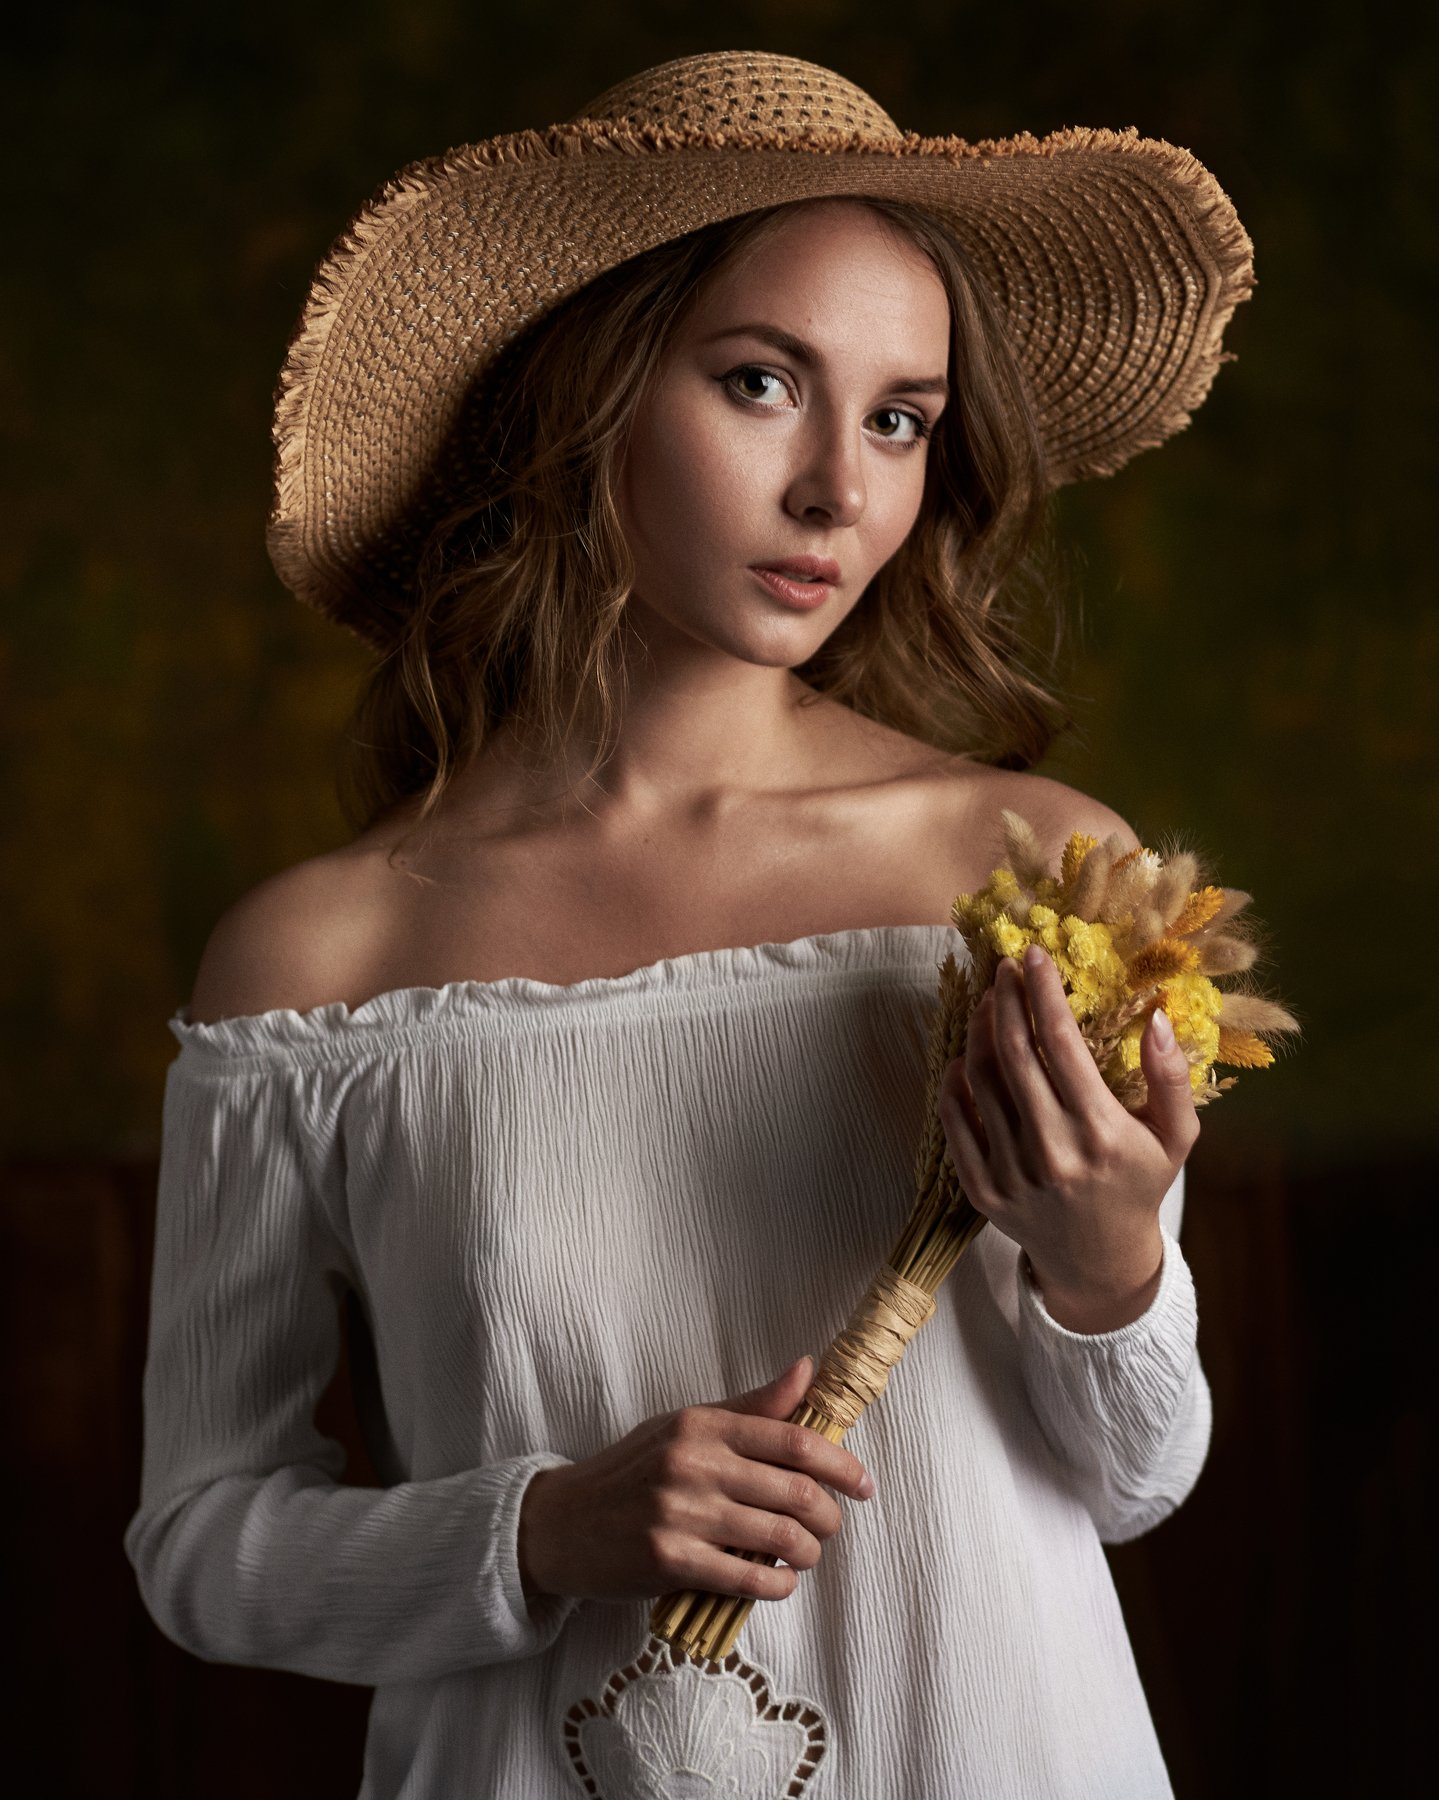 pyzhikphoto, портрет, классика, классический портрет, портрет девушки, женский портрет, portrait, classic, art, красавица, фото, девушка, Пыжик Максим